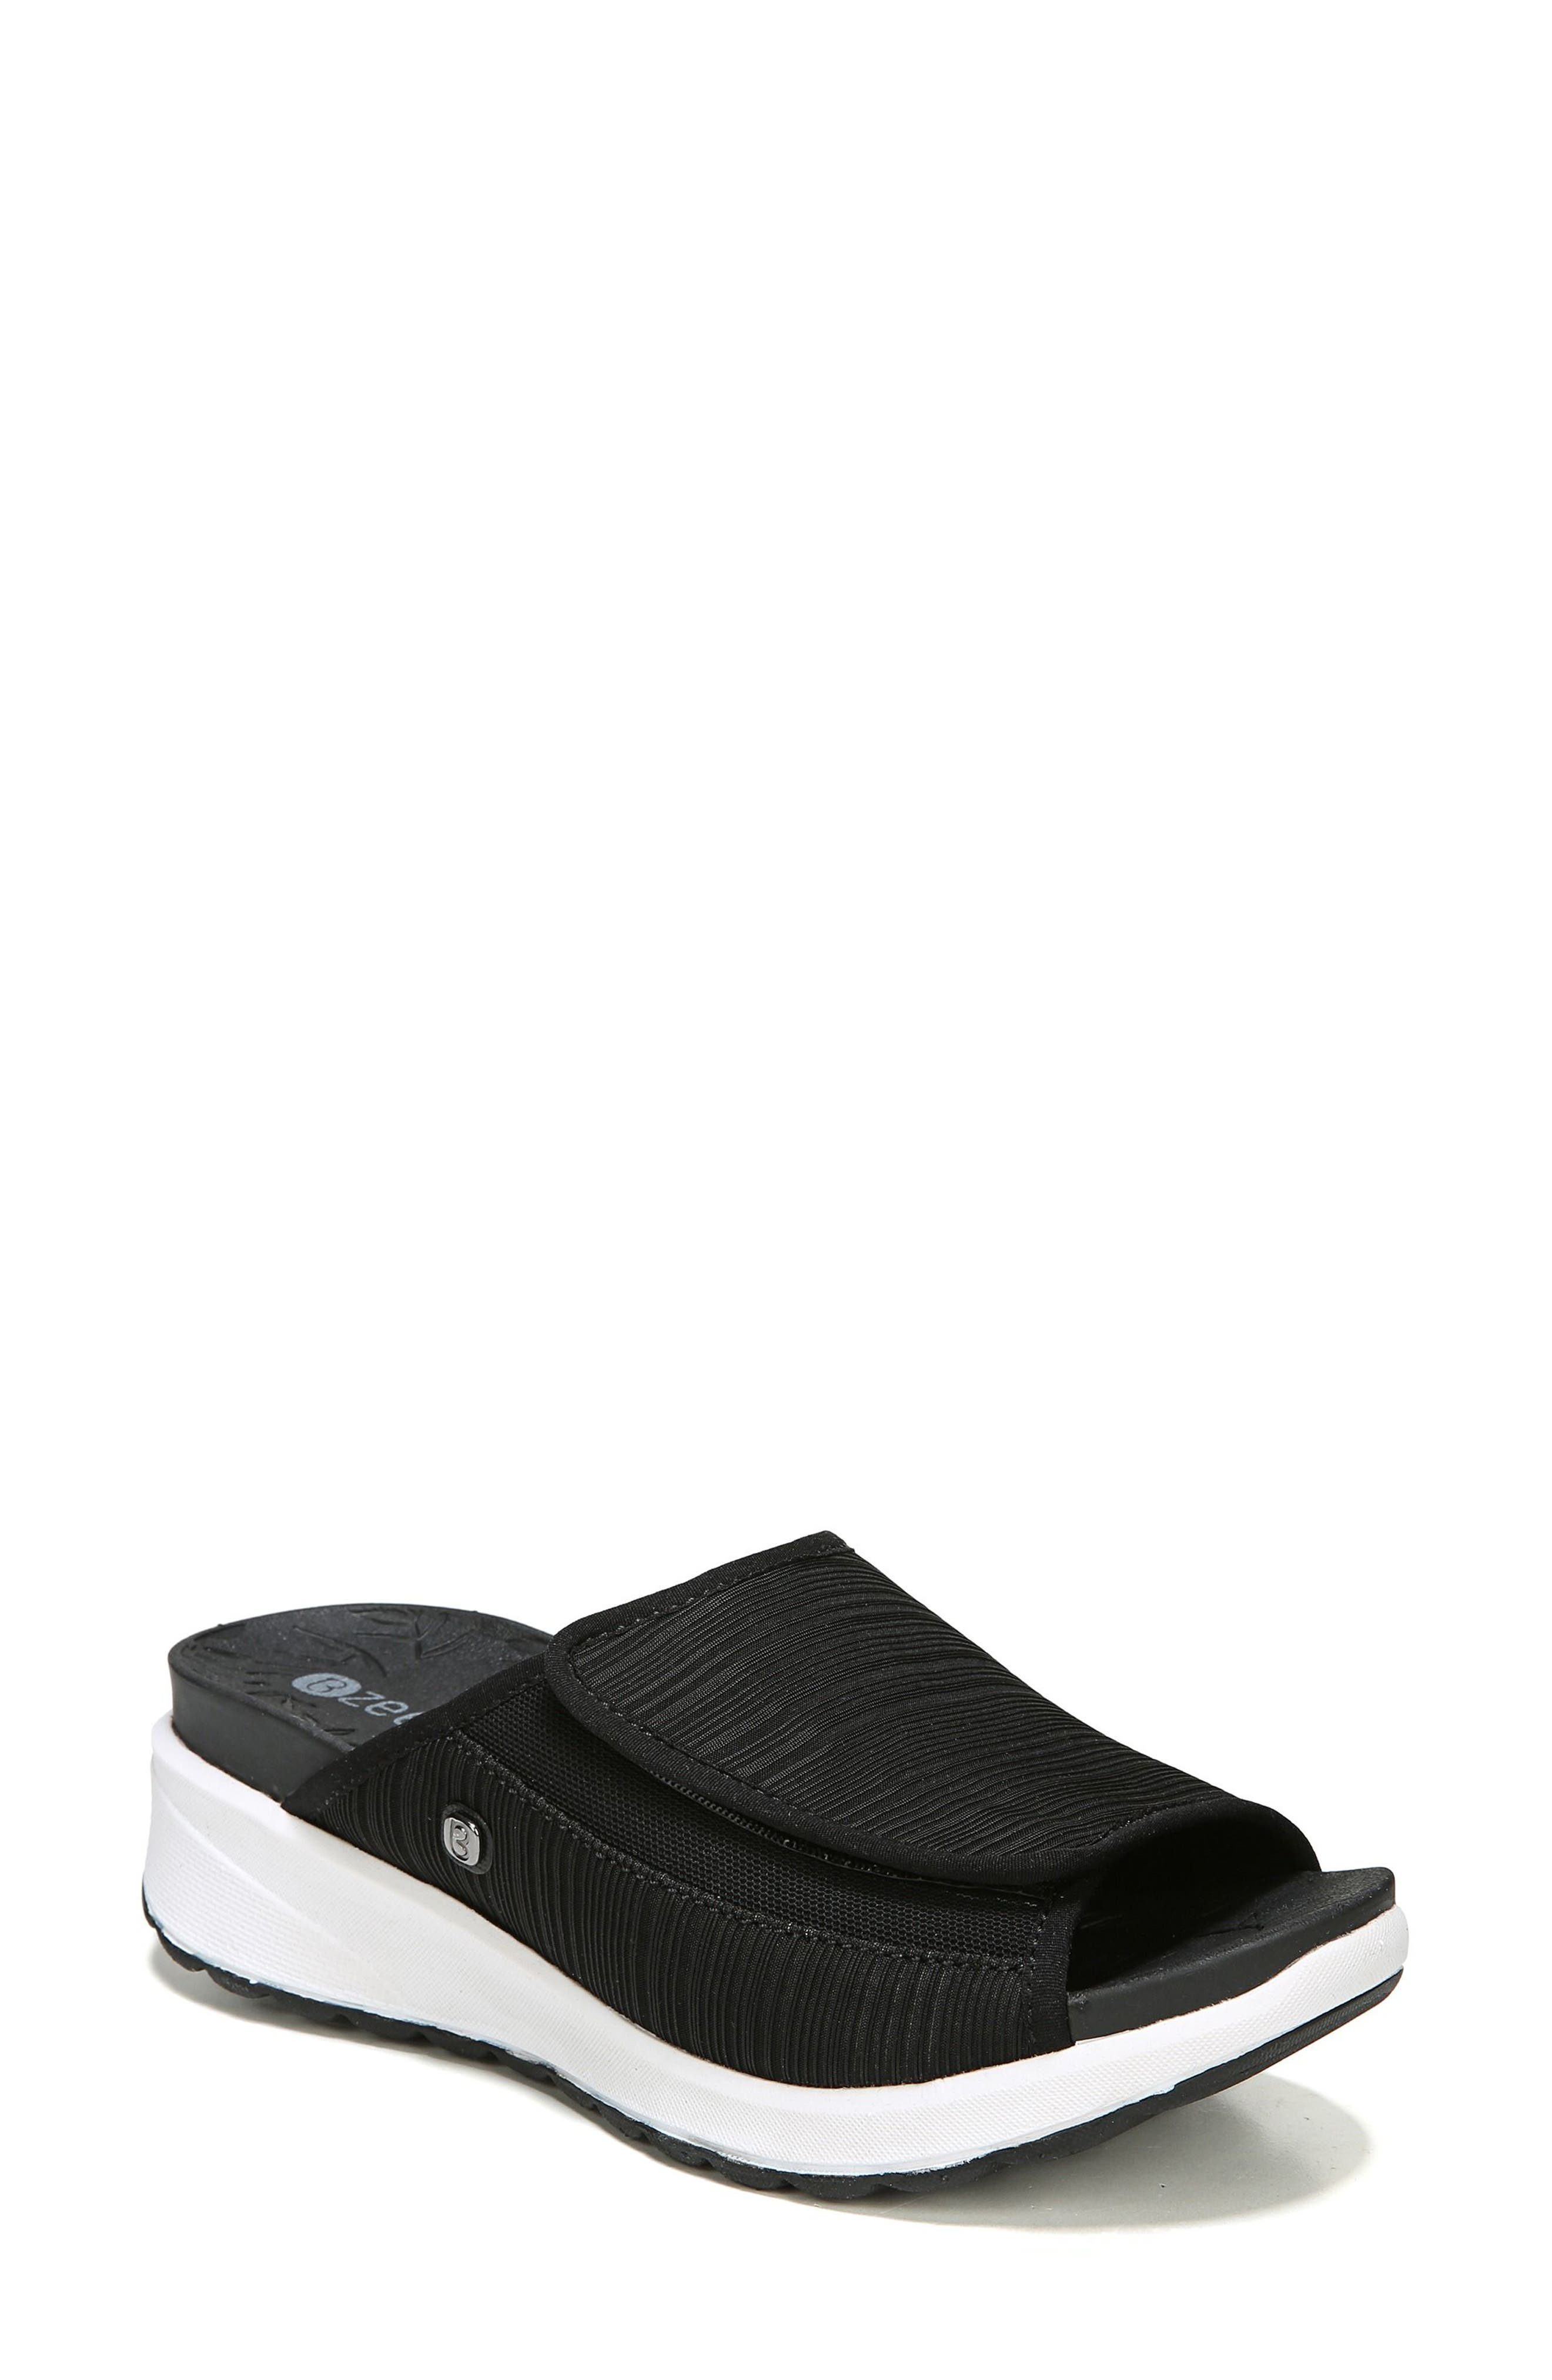 Galaxy Slide Sandal,                             Main thumbnail 1, color,                             BLACK FABRIC